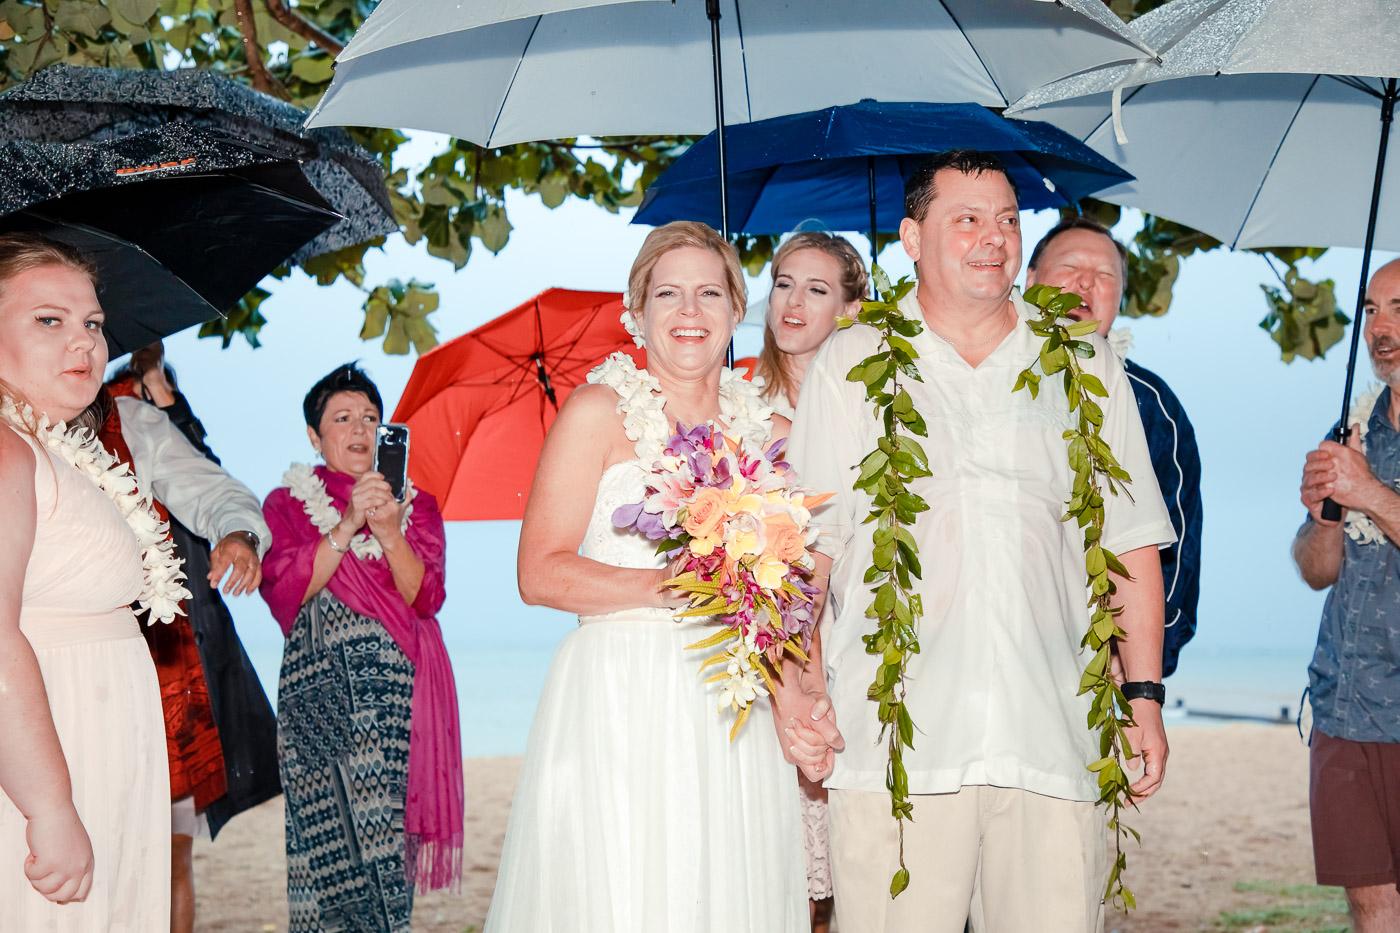 wedding-redux-41086.jpg